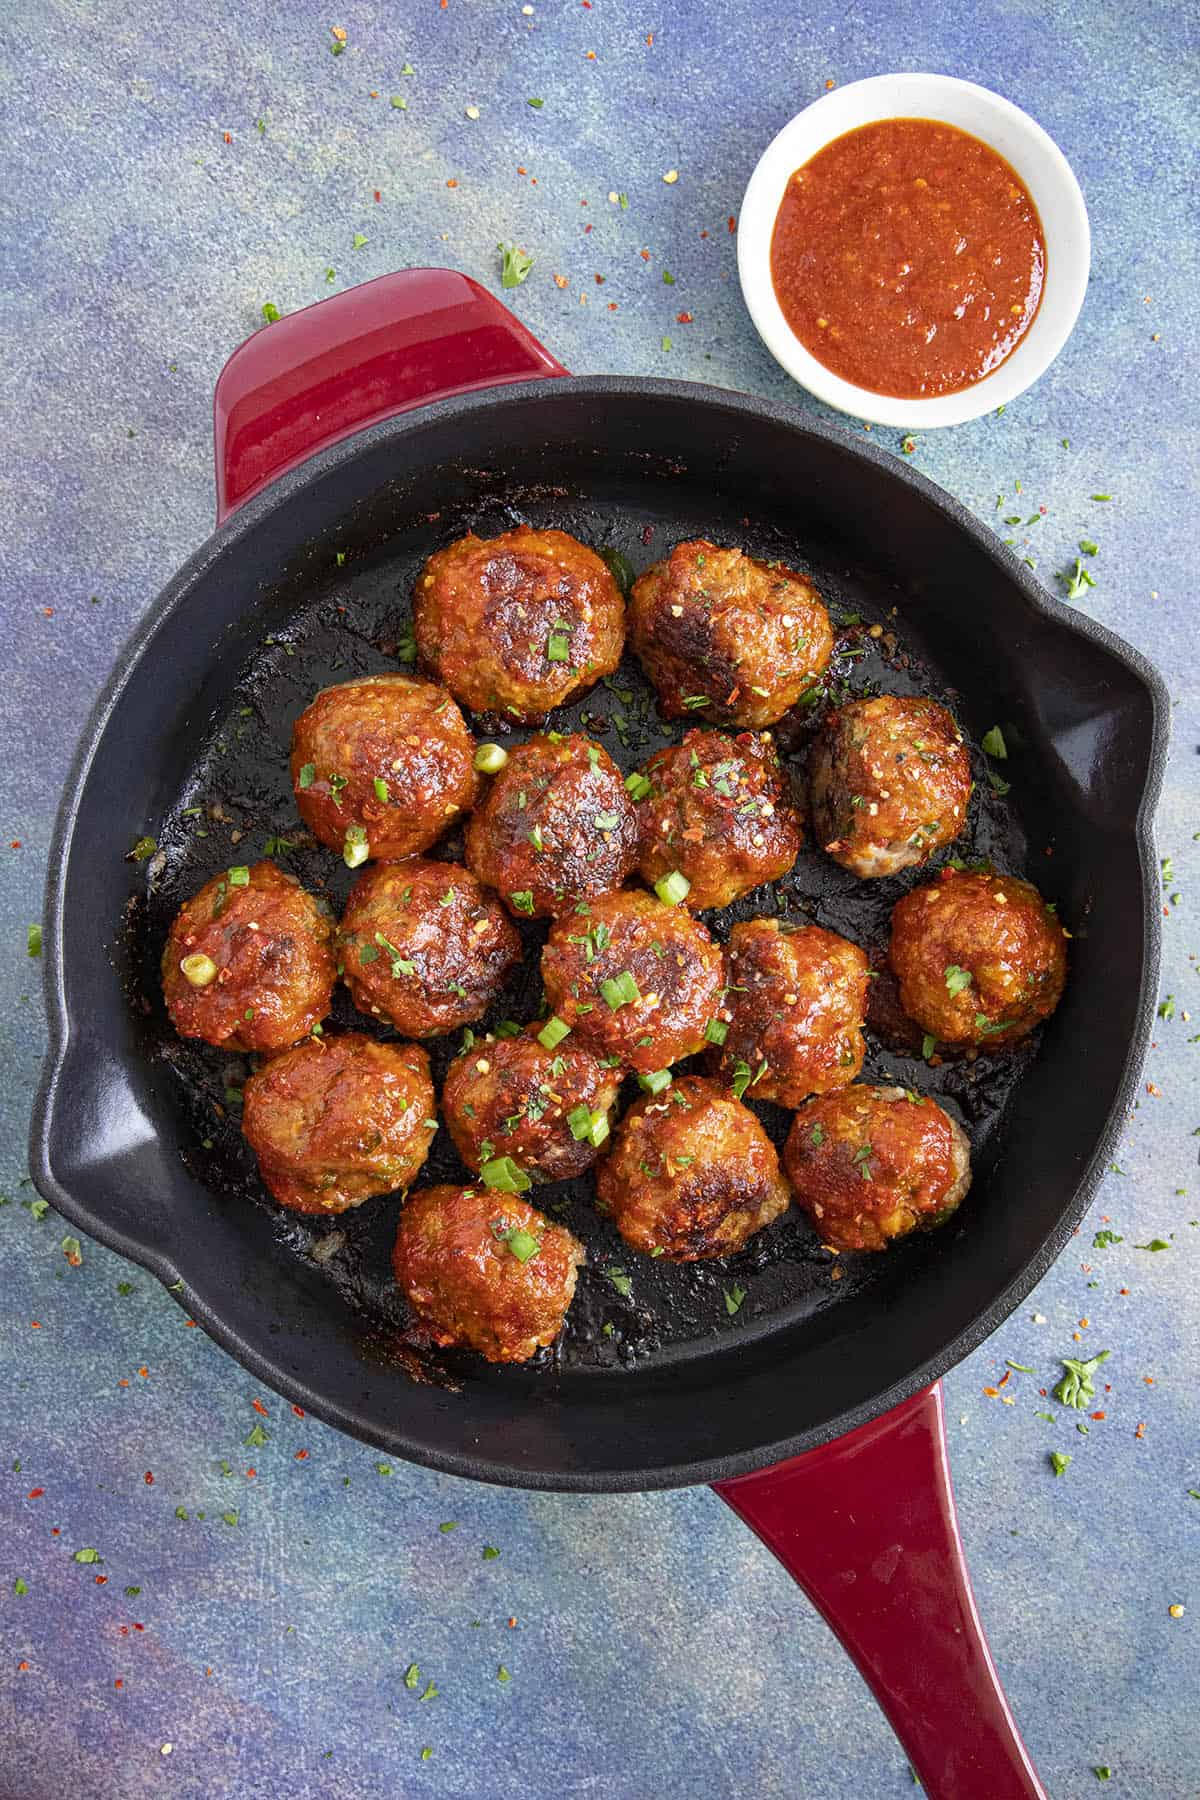 Honey Sriracha Turkey Meatballs in a pan, ready to serve